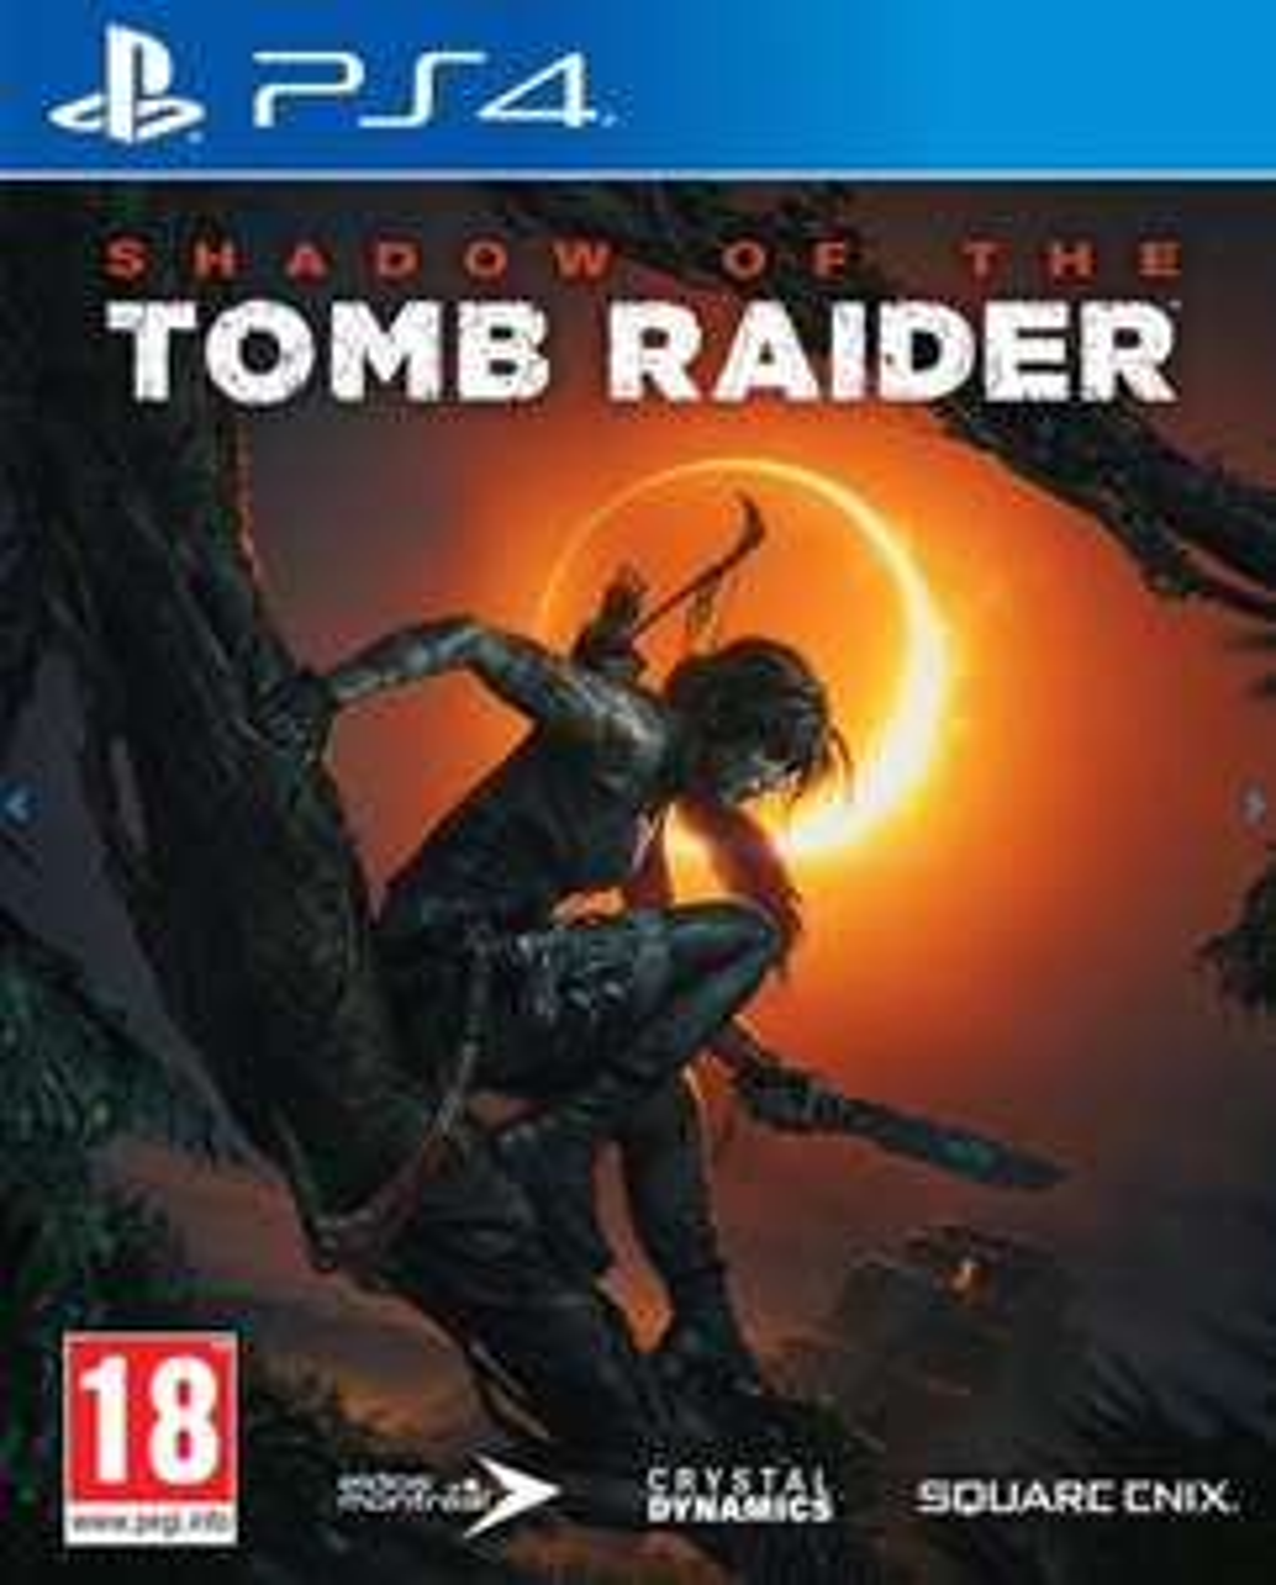 Jeu Shadow of the Tomb Raider sur PS4 (collishop.be, Frontaliers Belgique)